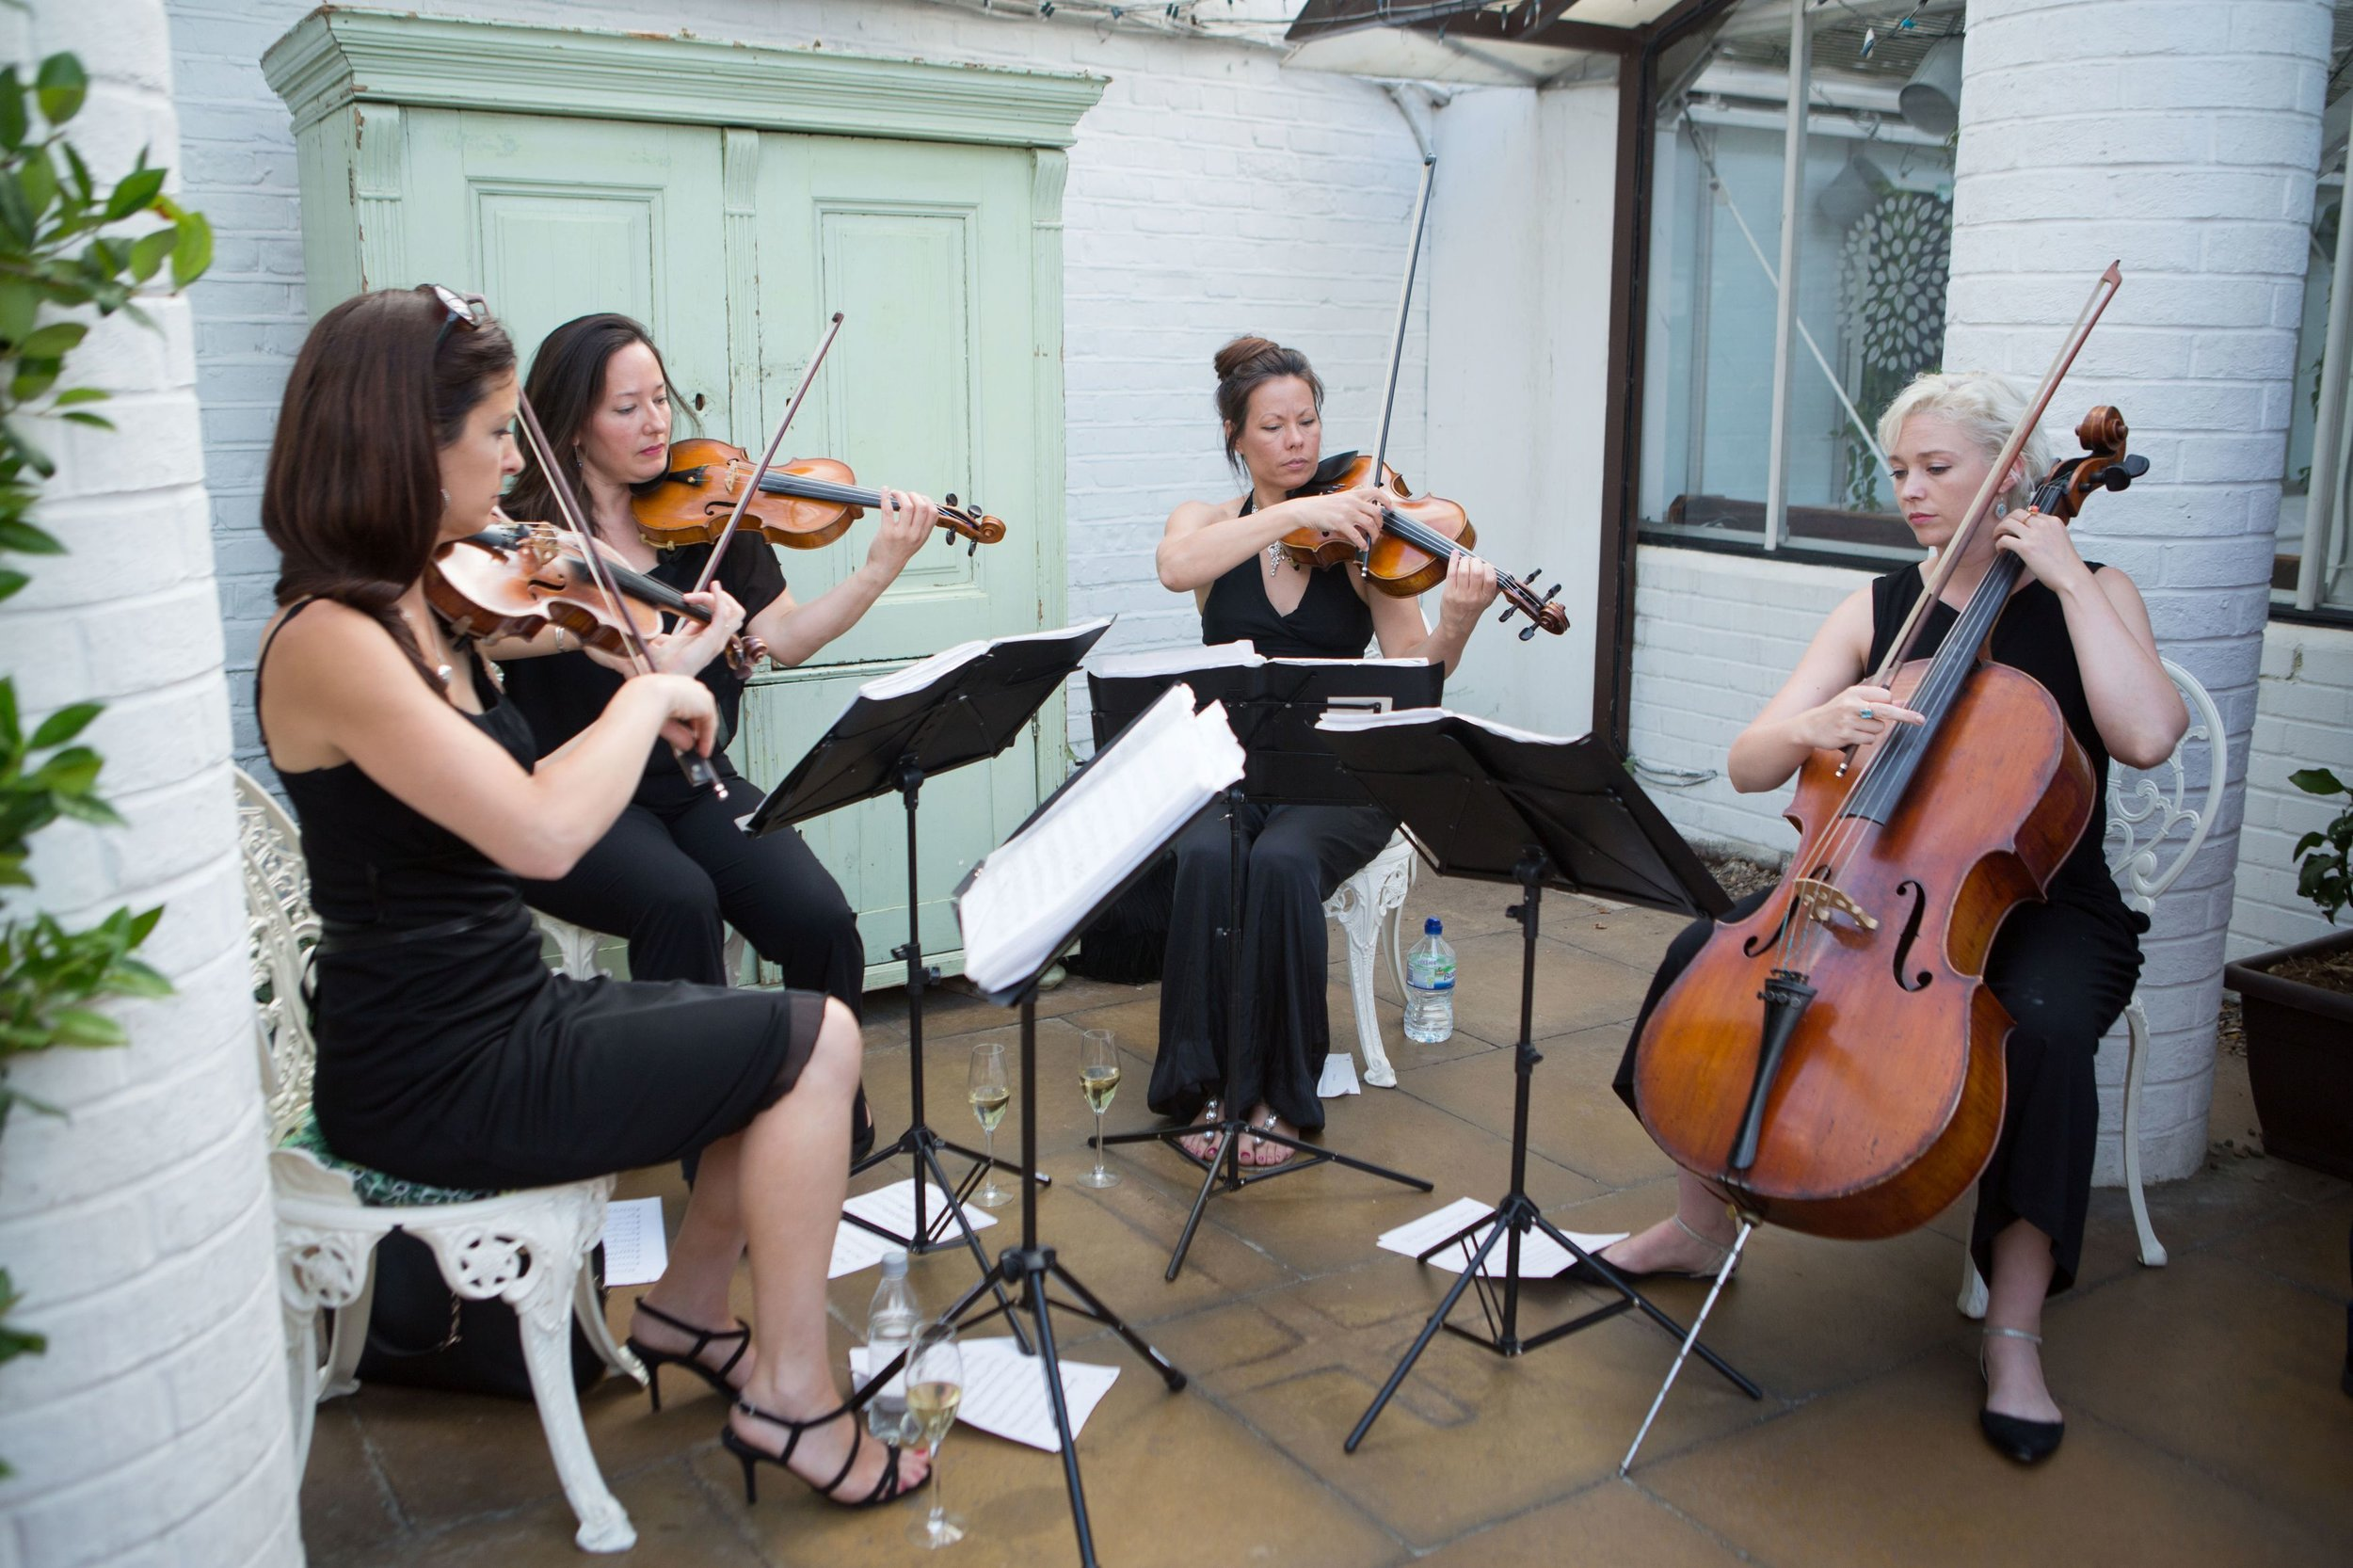 Hulya_&_Ben's_Clifton_Nurseries_London_Wedding_0488.jpg